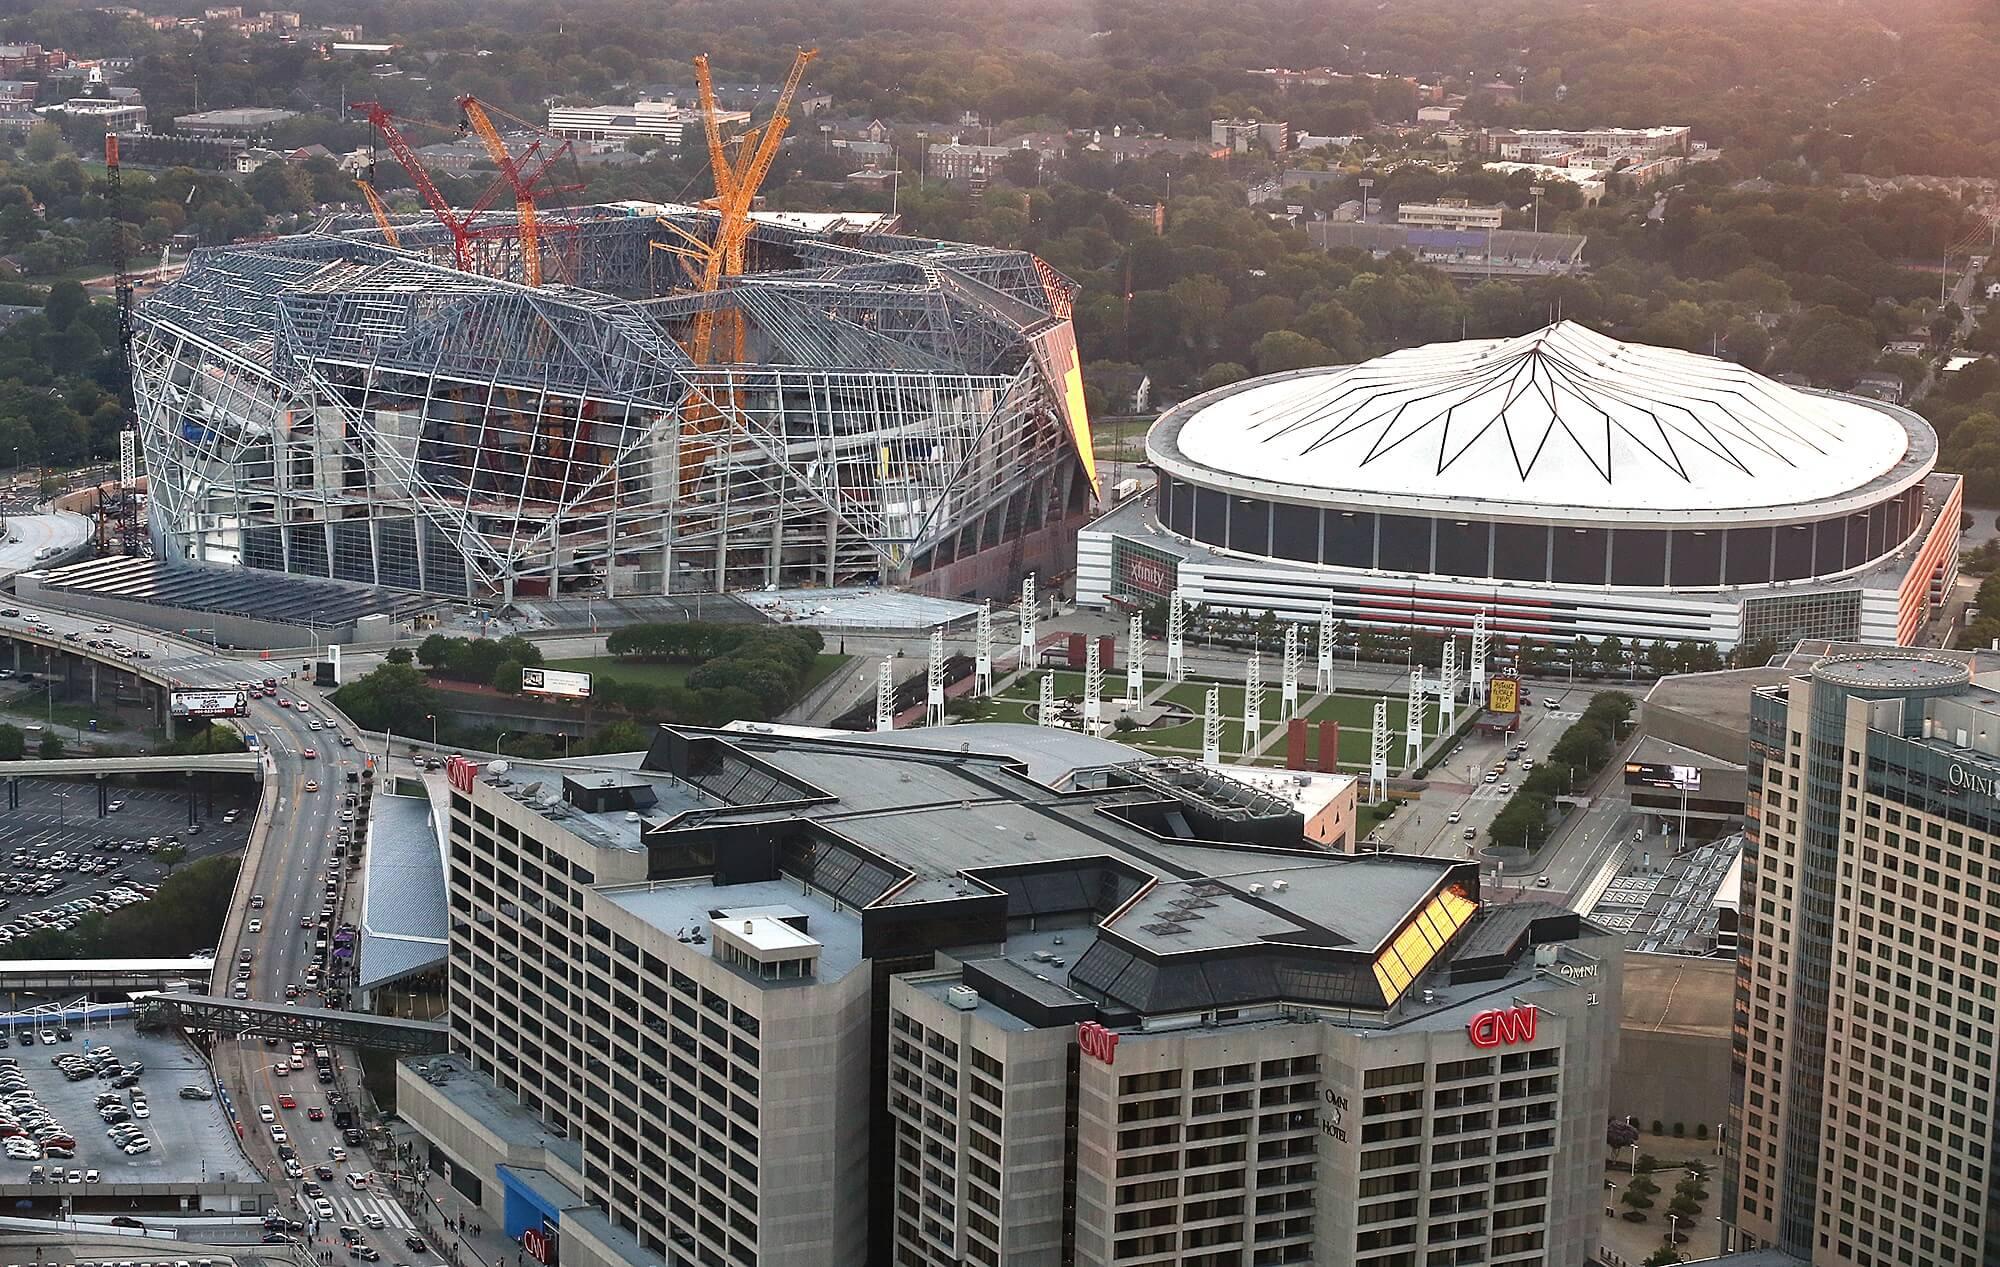 The atlanta falcons new football stadium for Atlanta ga mercedes benz stadium